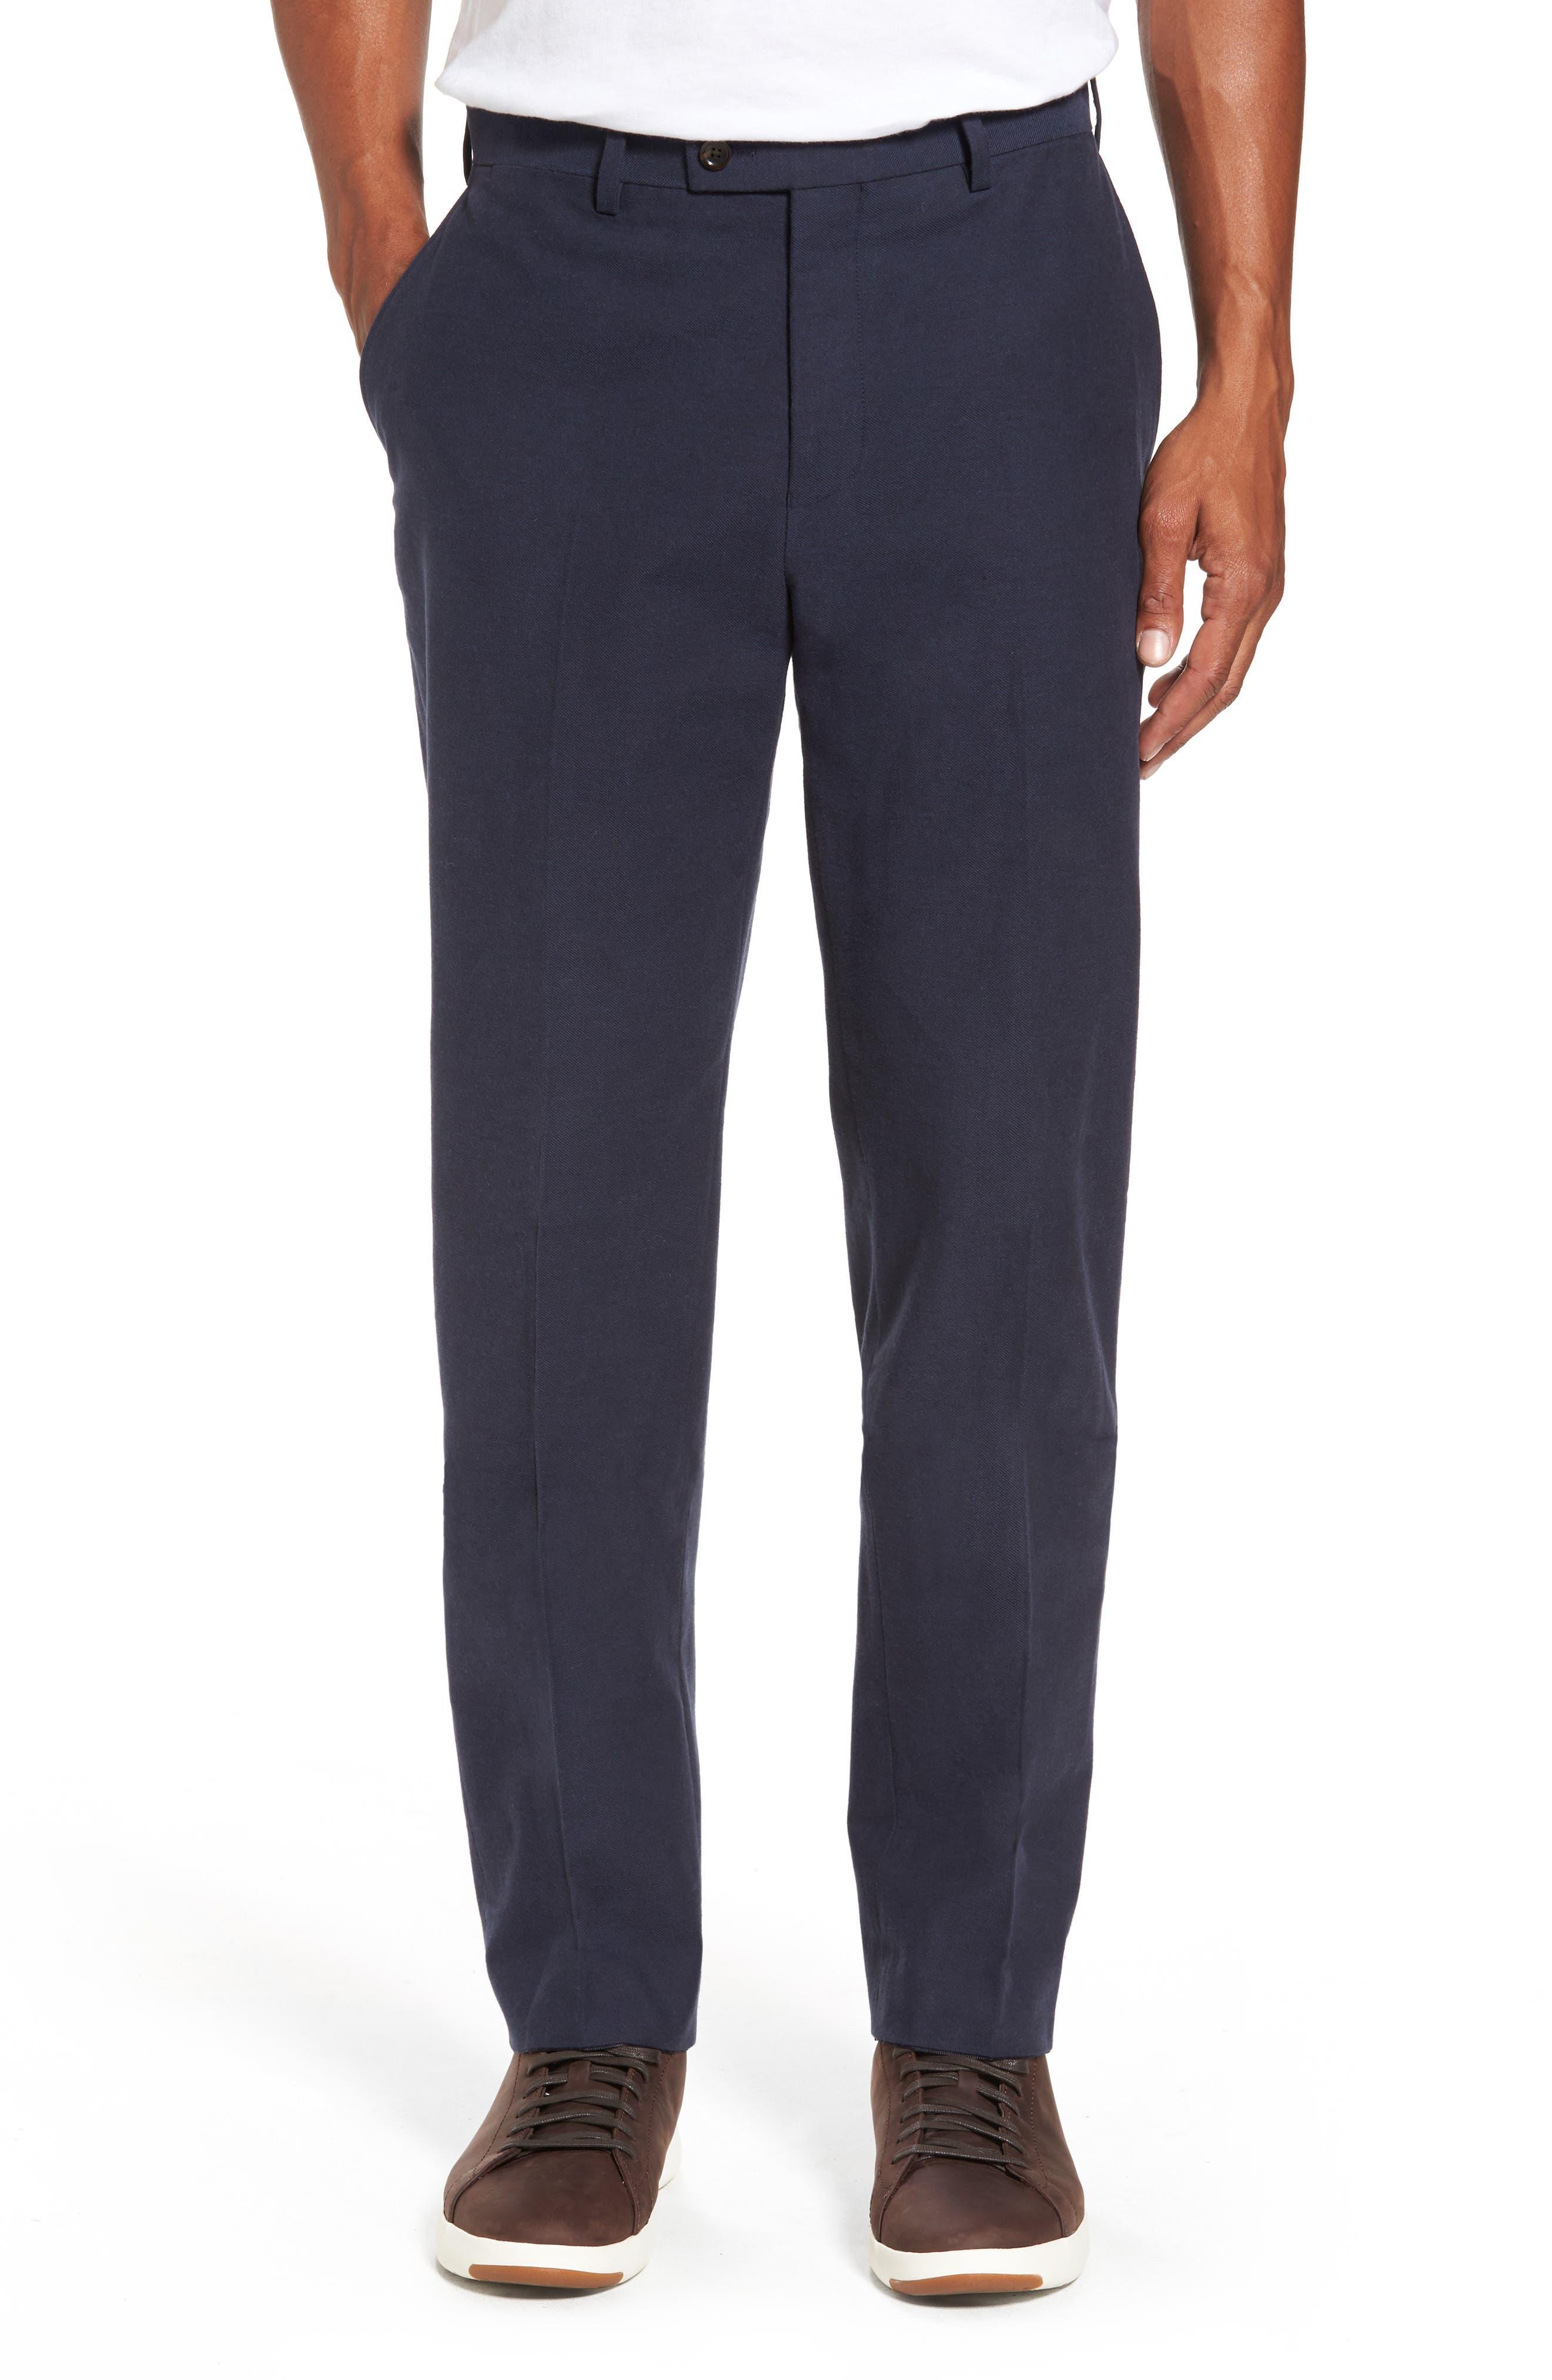 Pembroke Slim Fit Twill Pants,                             Main thumbnail 1, color,                             410